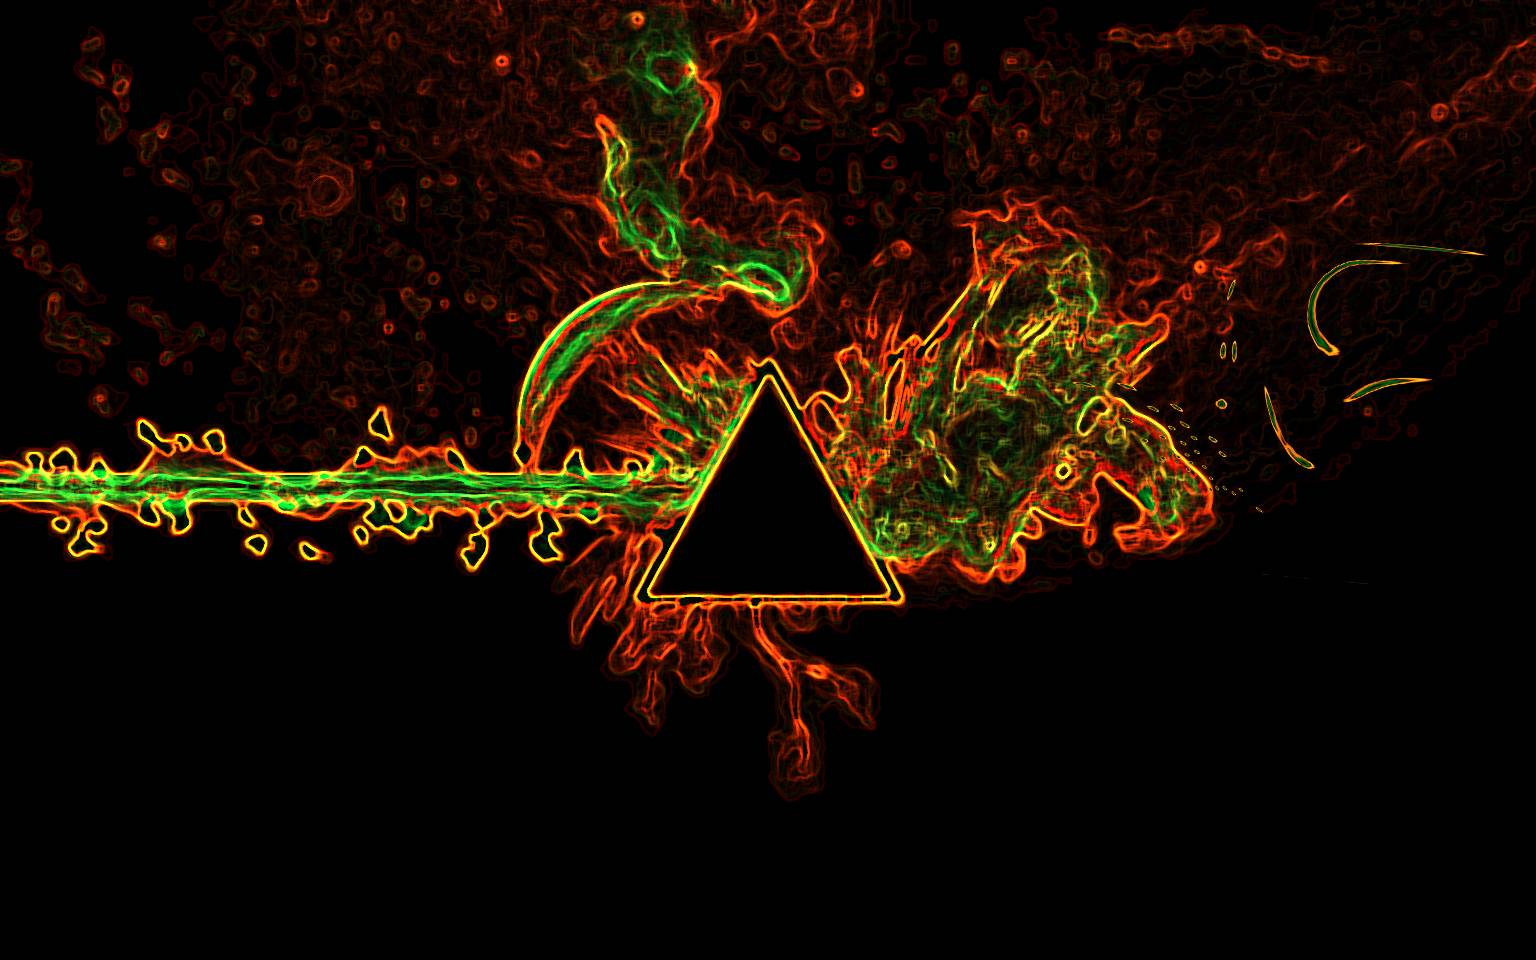 Px Pink Floyd Wallpapers Pink Floyd Wallpapers Collection